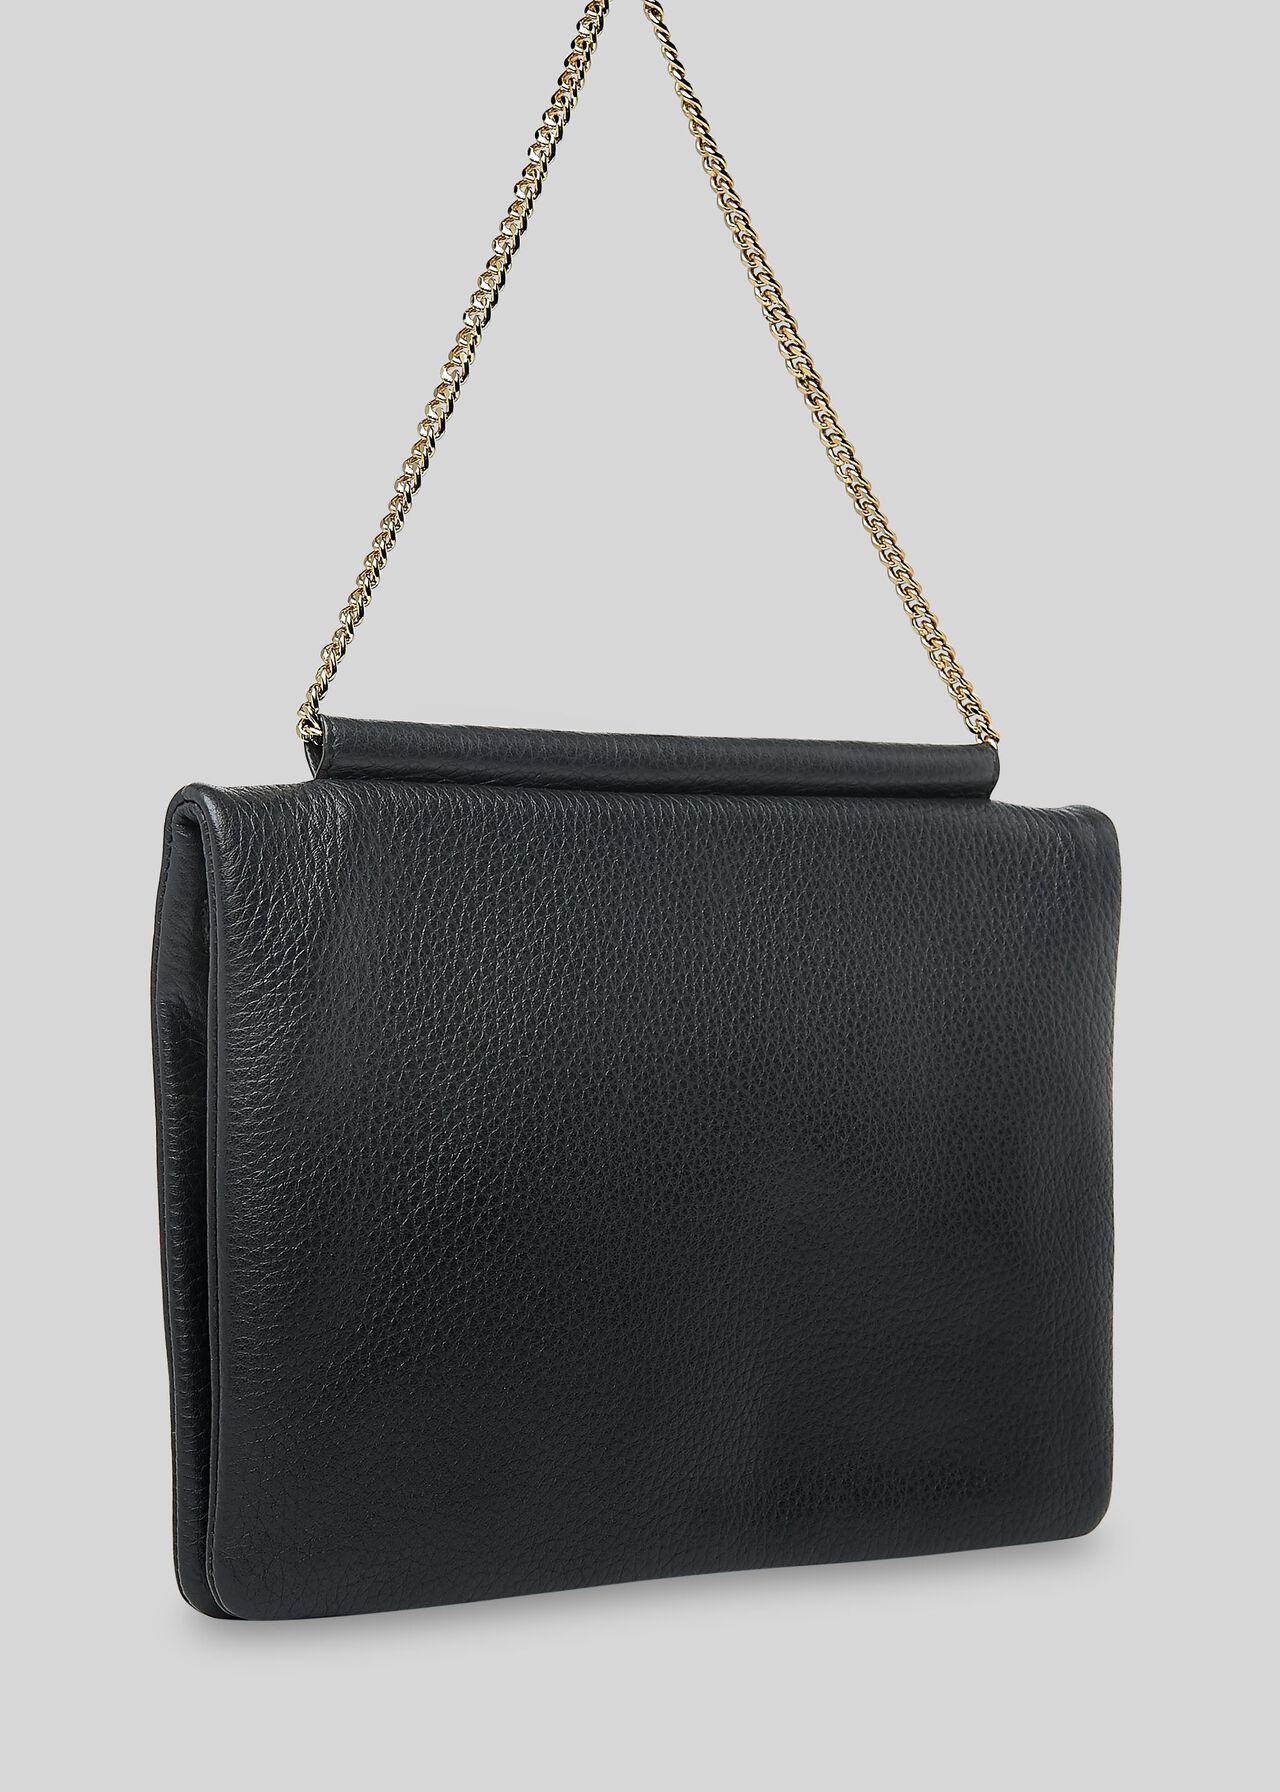 Nala Chain Foldover Clutch Black